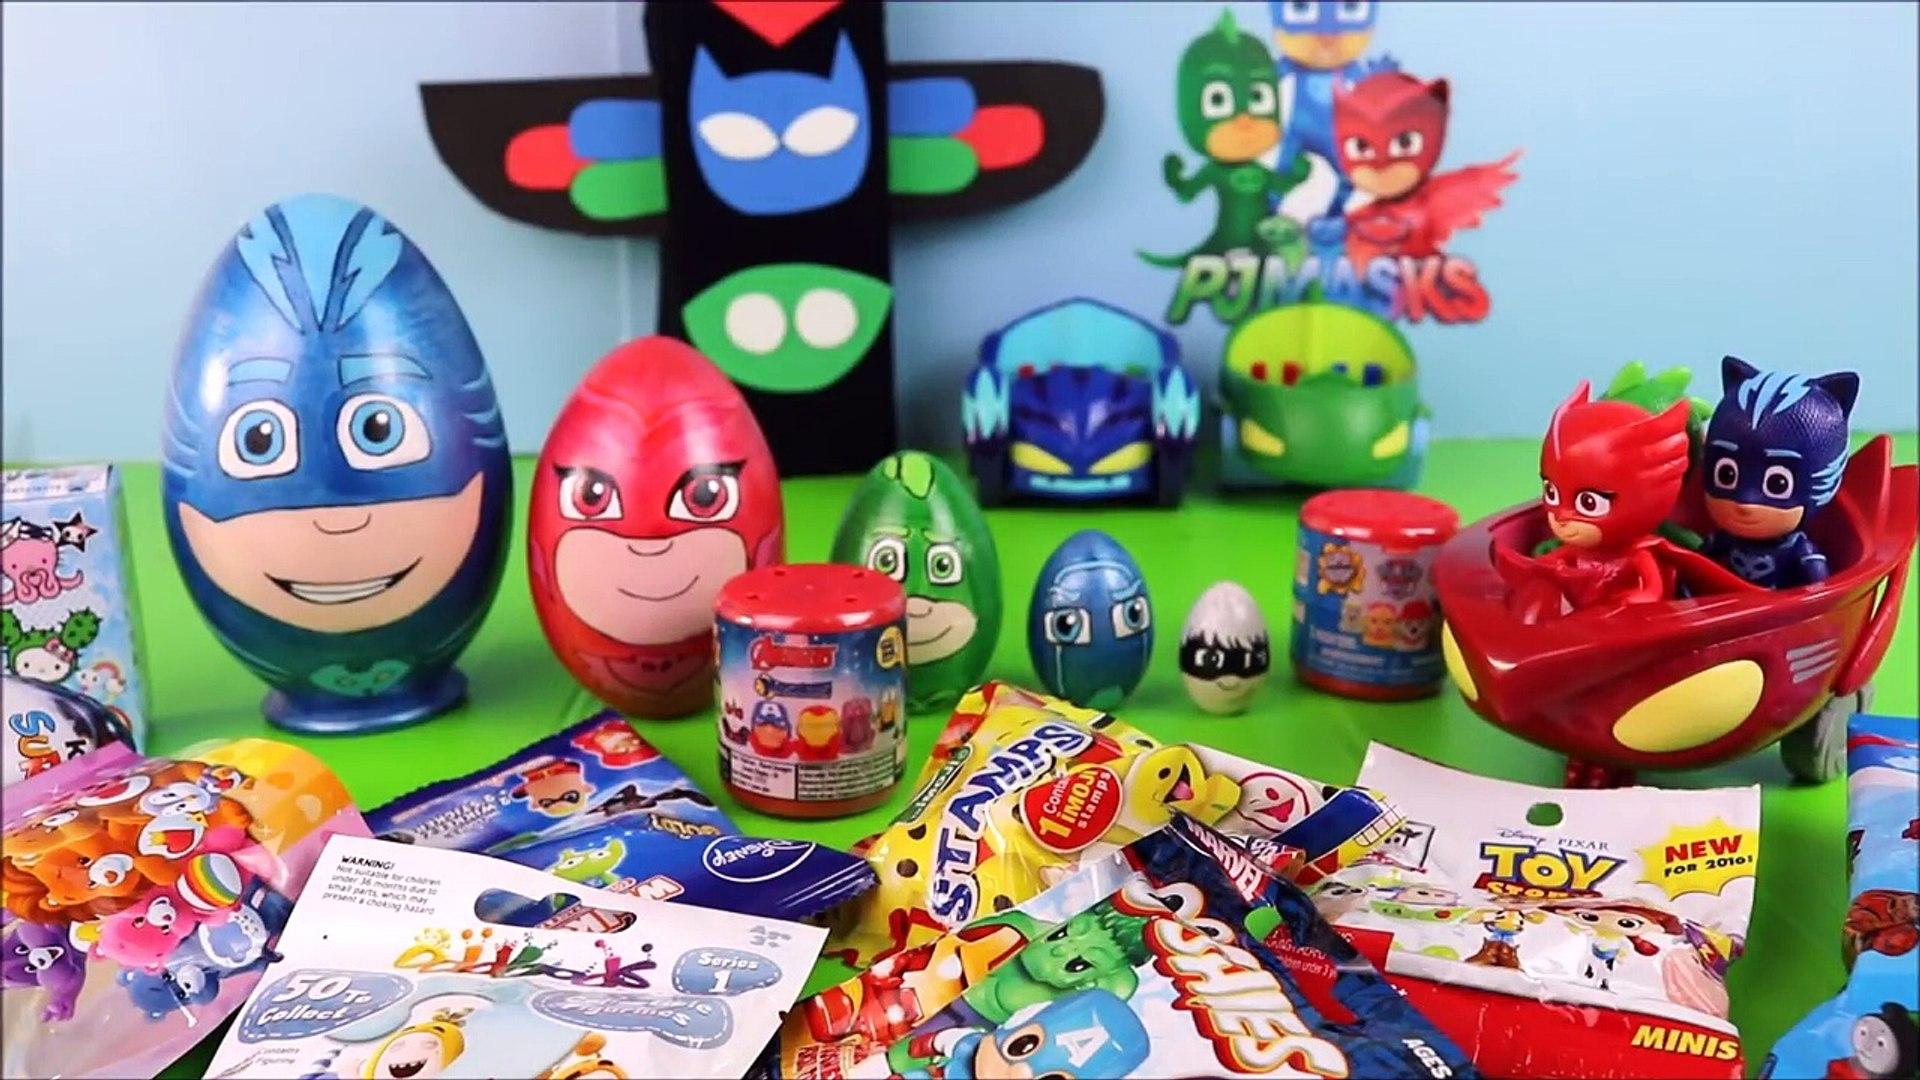 PJ Masks Toy Surprise Nesting Eggs! Disney toys, PJ Masks Episode, Kids Stacking Surprise Toys Video